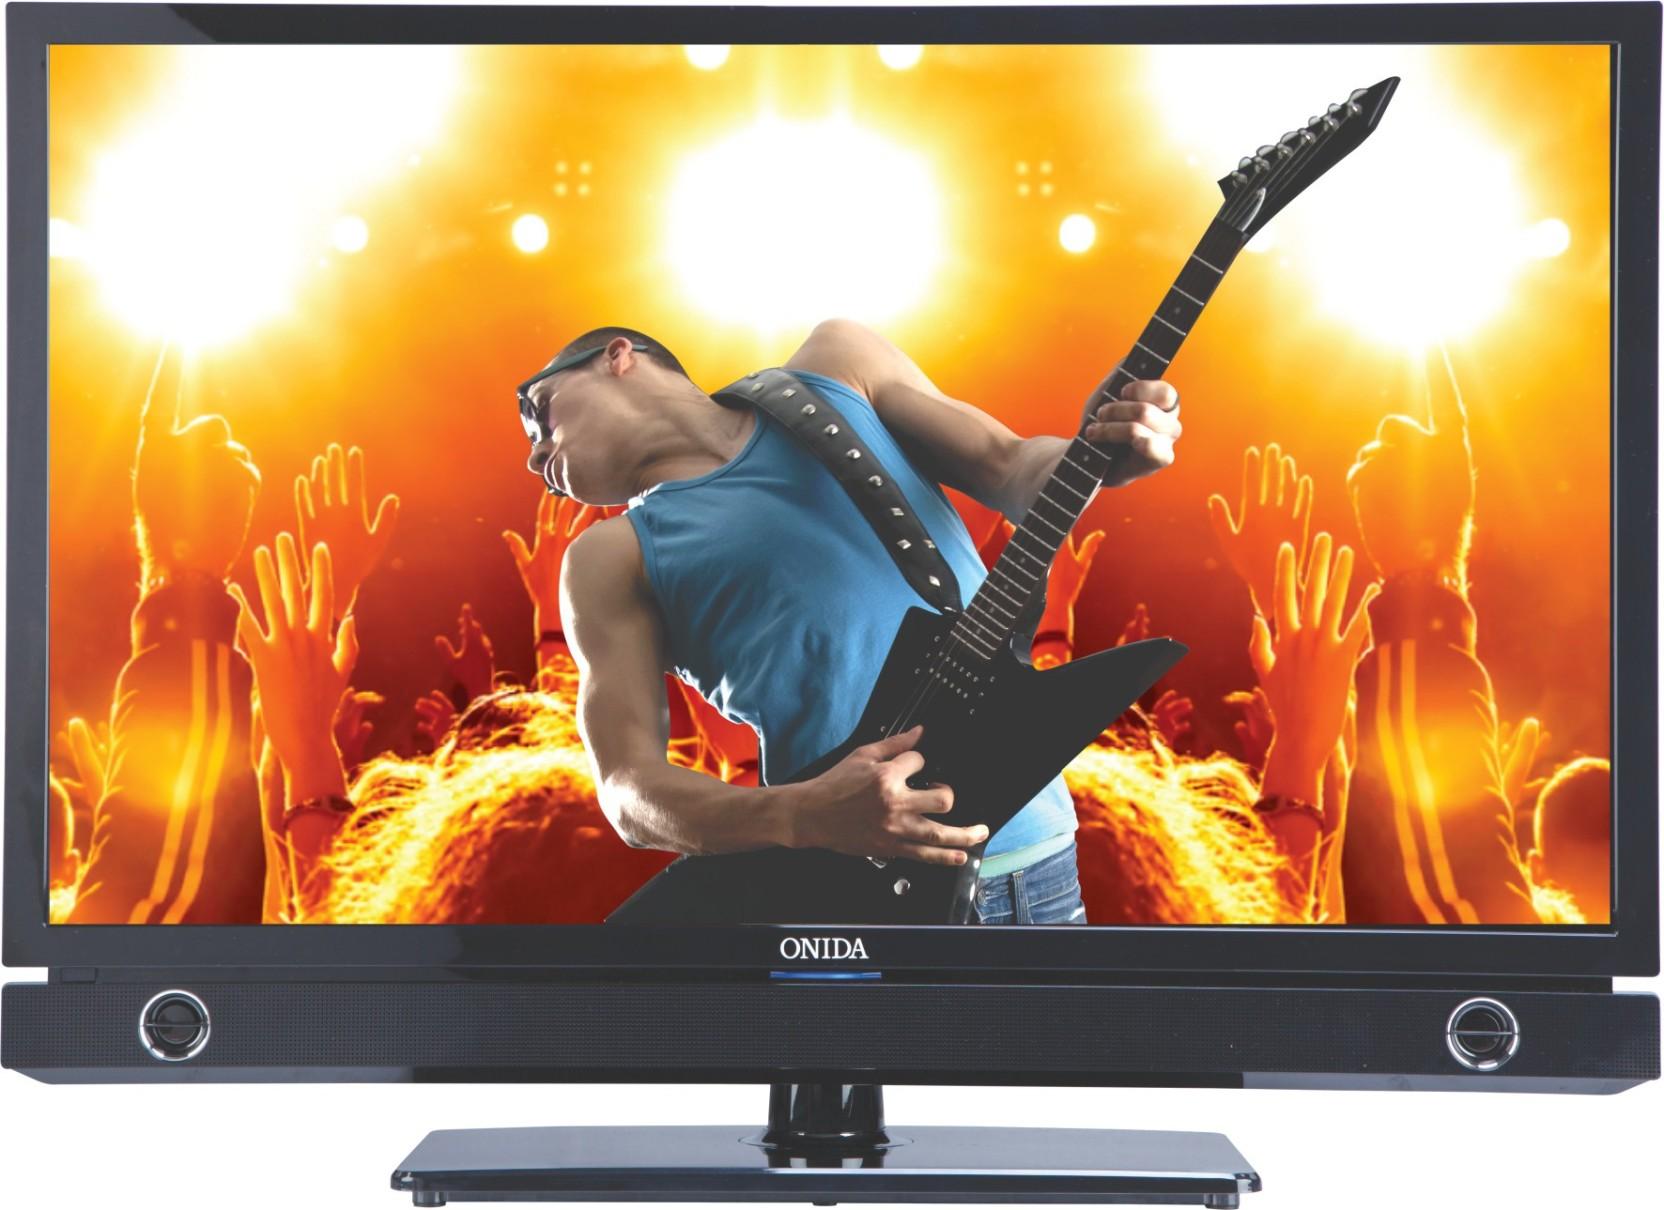 onida 81cm 32 inch hd ready led tv online at best prices. Black Bedroom Furniture Sets. Home Design Ideas